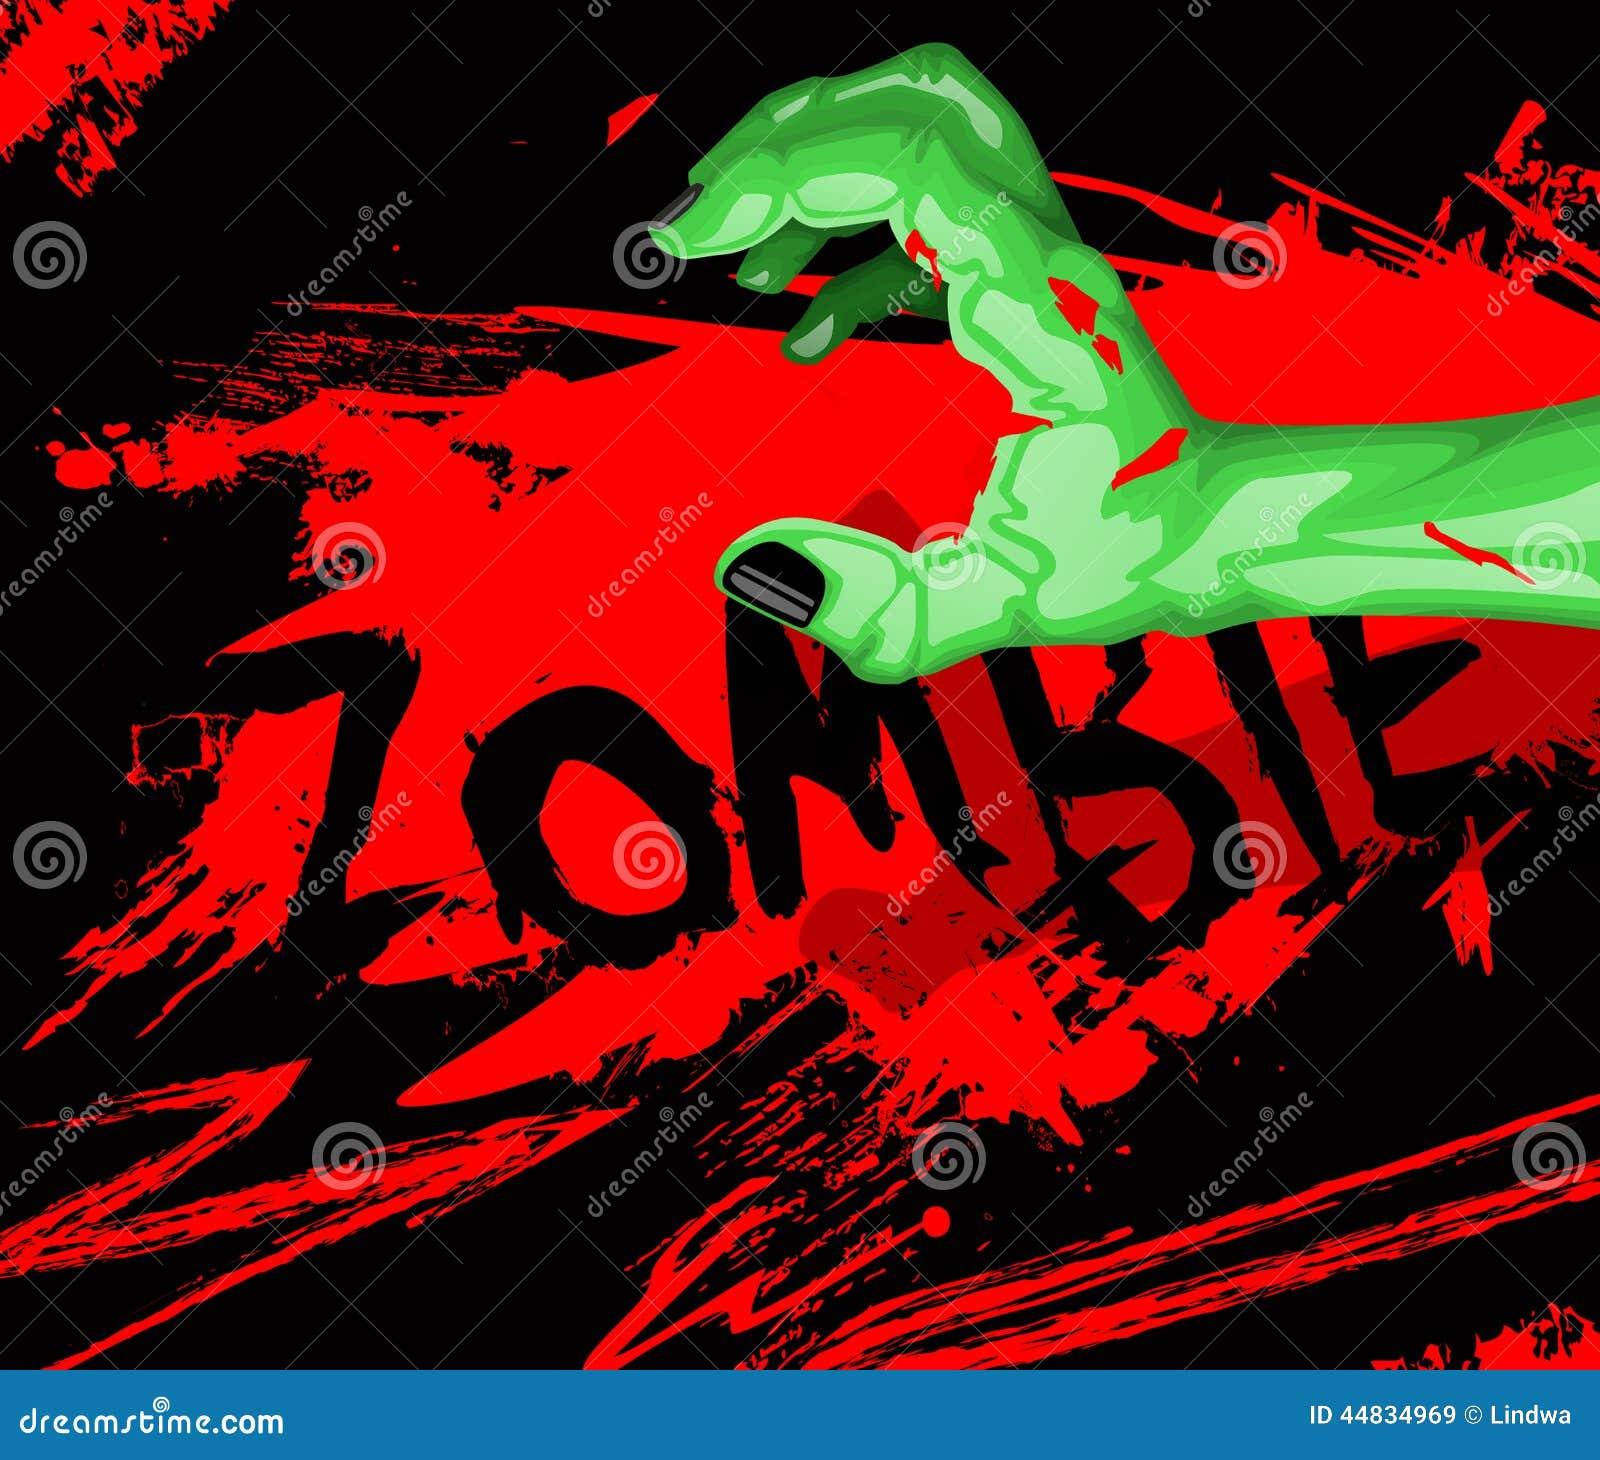 Cartoon of a zombie hand